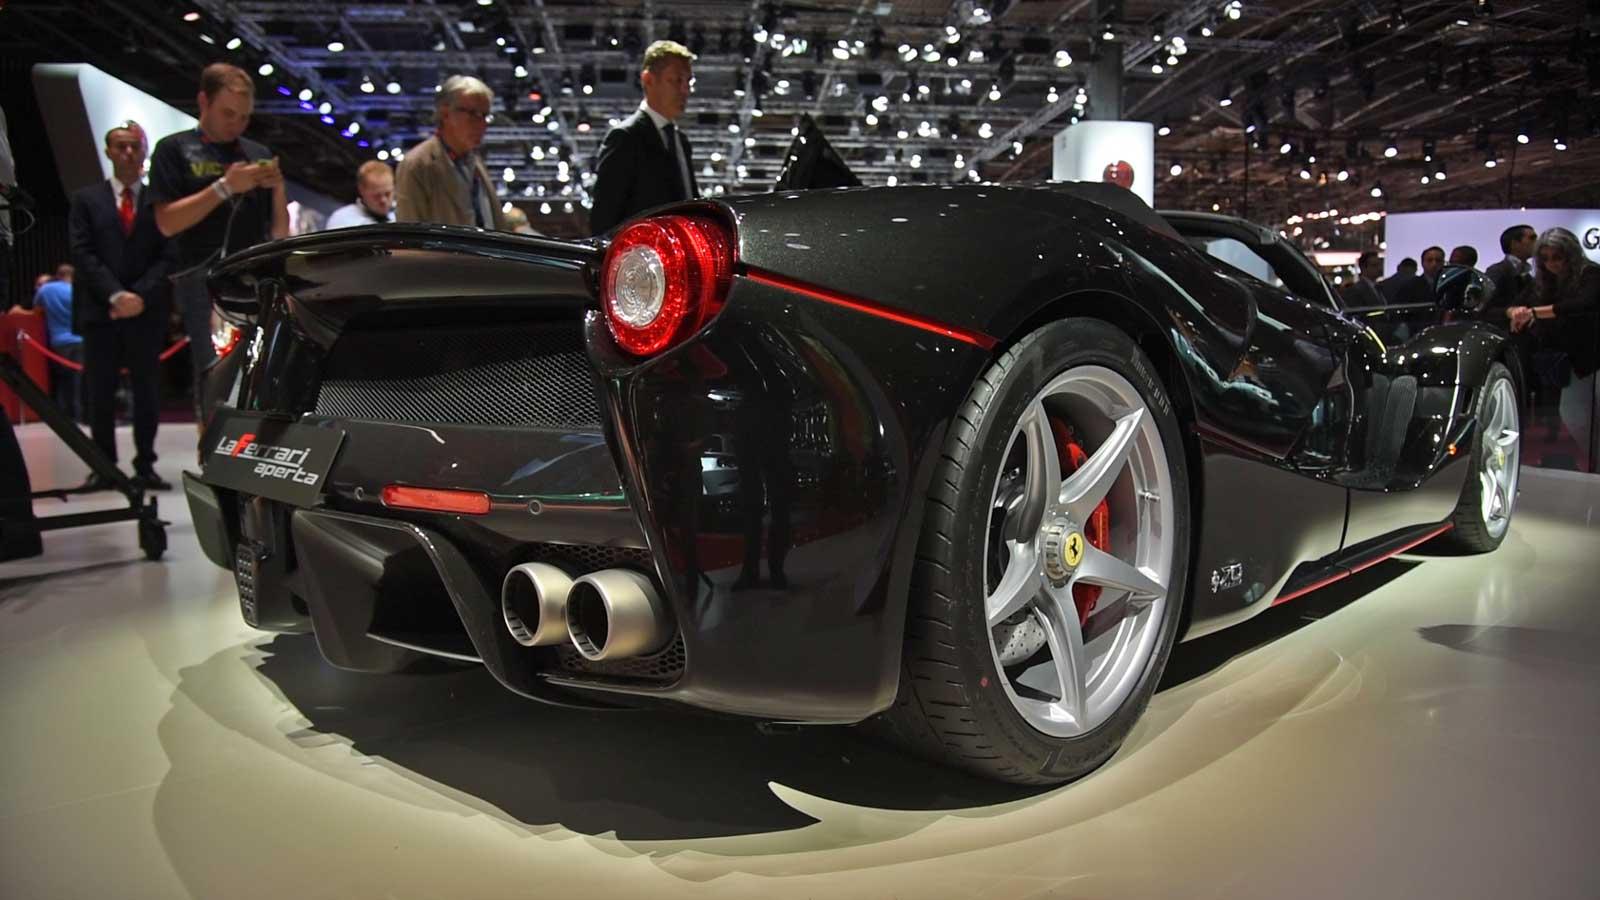 2017-Ferrari-LaFerrari-Aperta-Rear